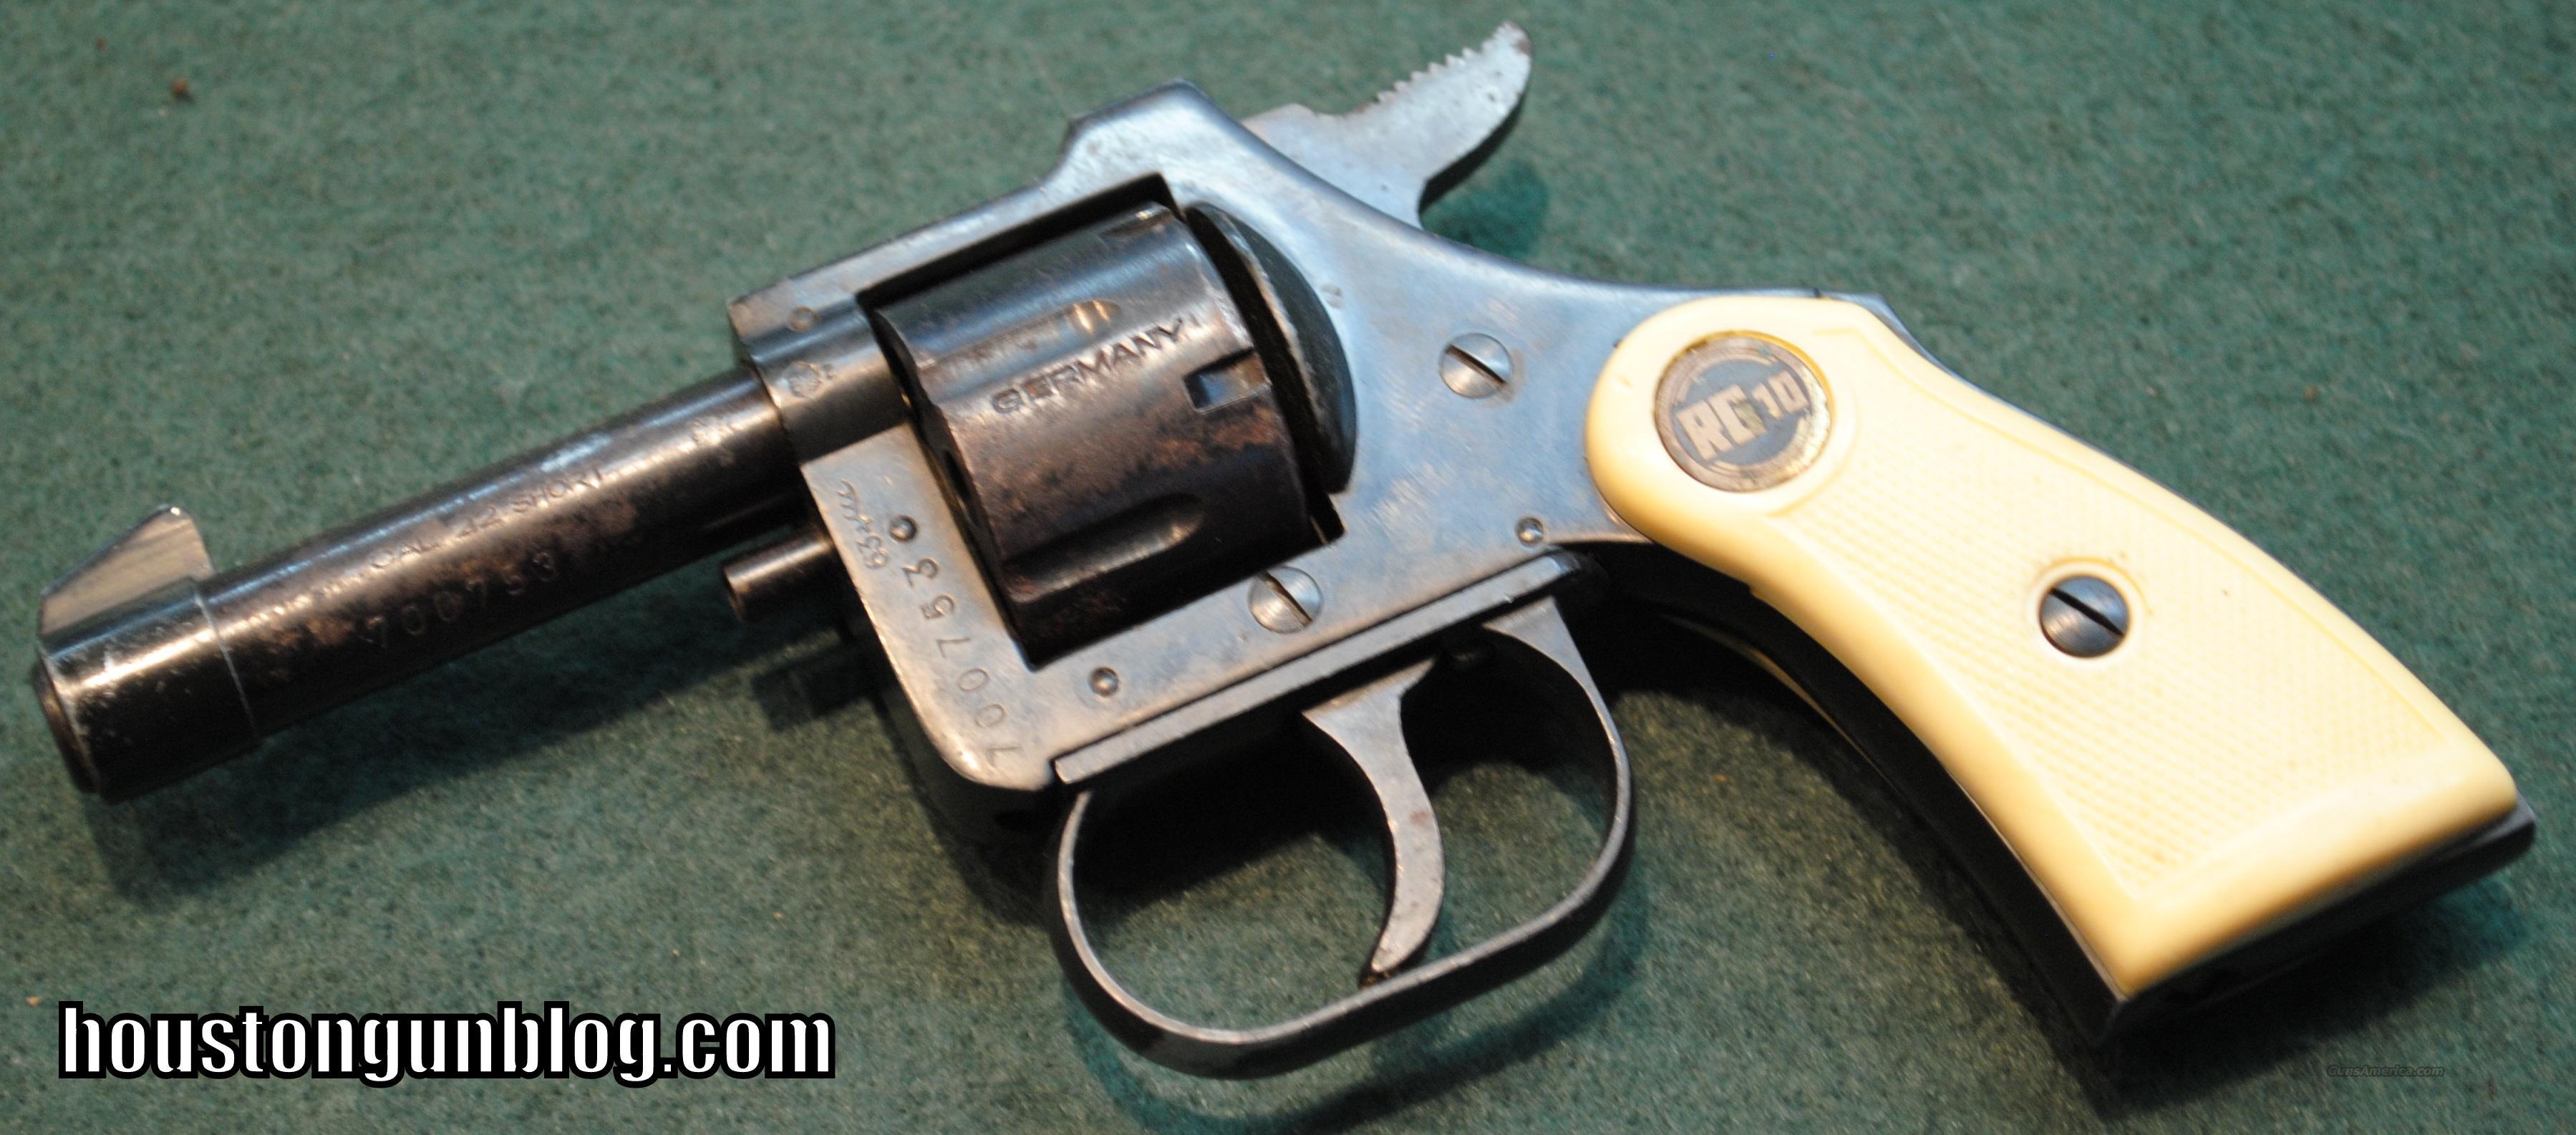 Rohm rg revolver 22 short made in germany cheap guns gt pistols gt r